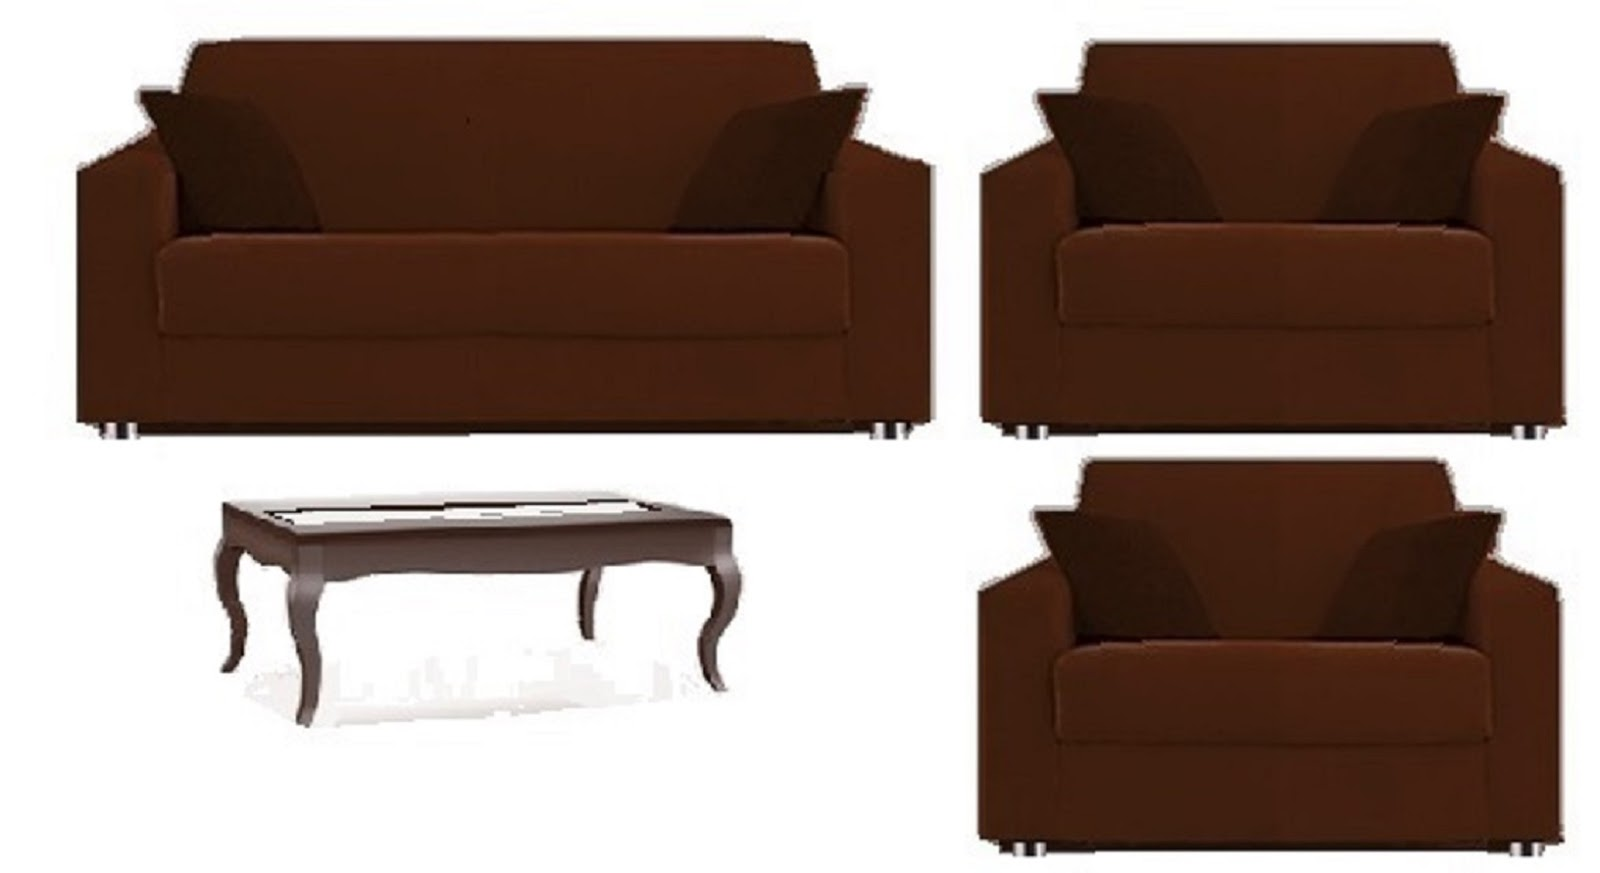 Sofa Cama Bogota Colombia European Muebles R Andr